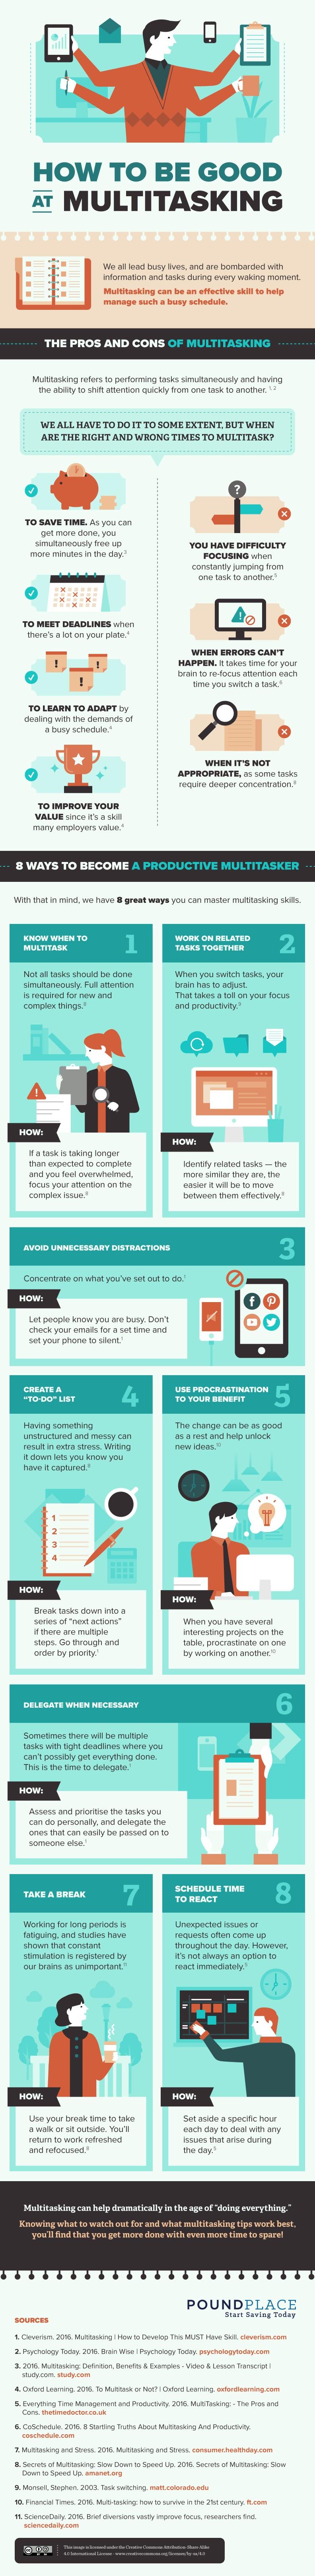 8 maneras de convertirte en un multitasker productivo